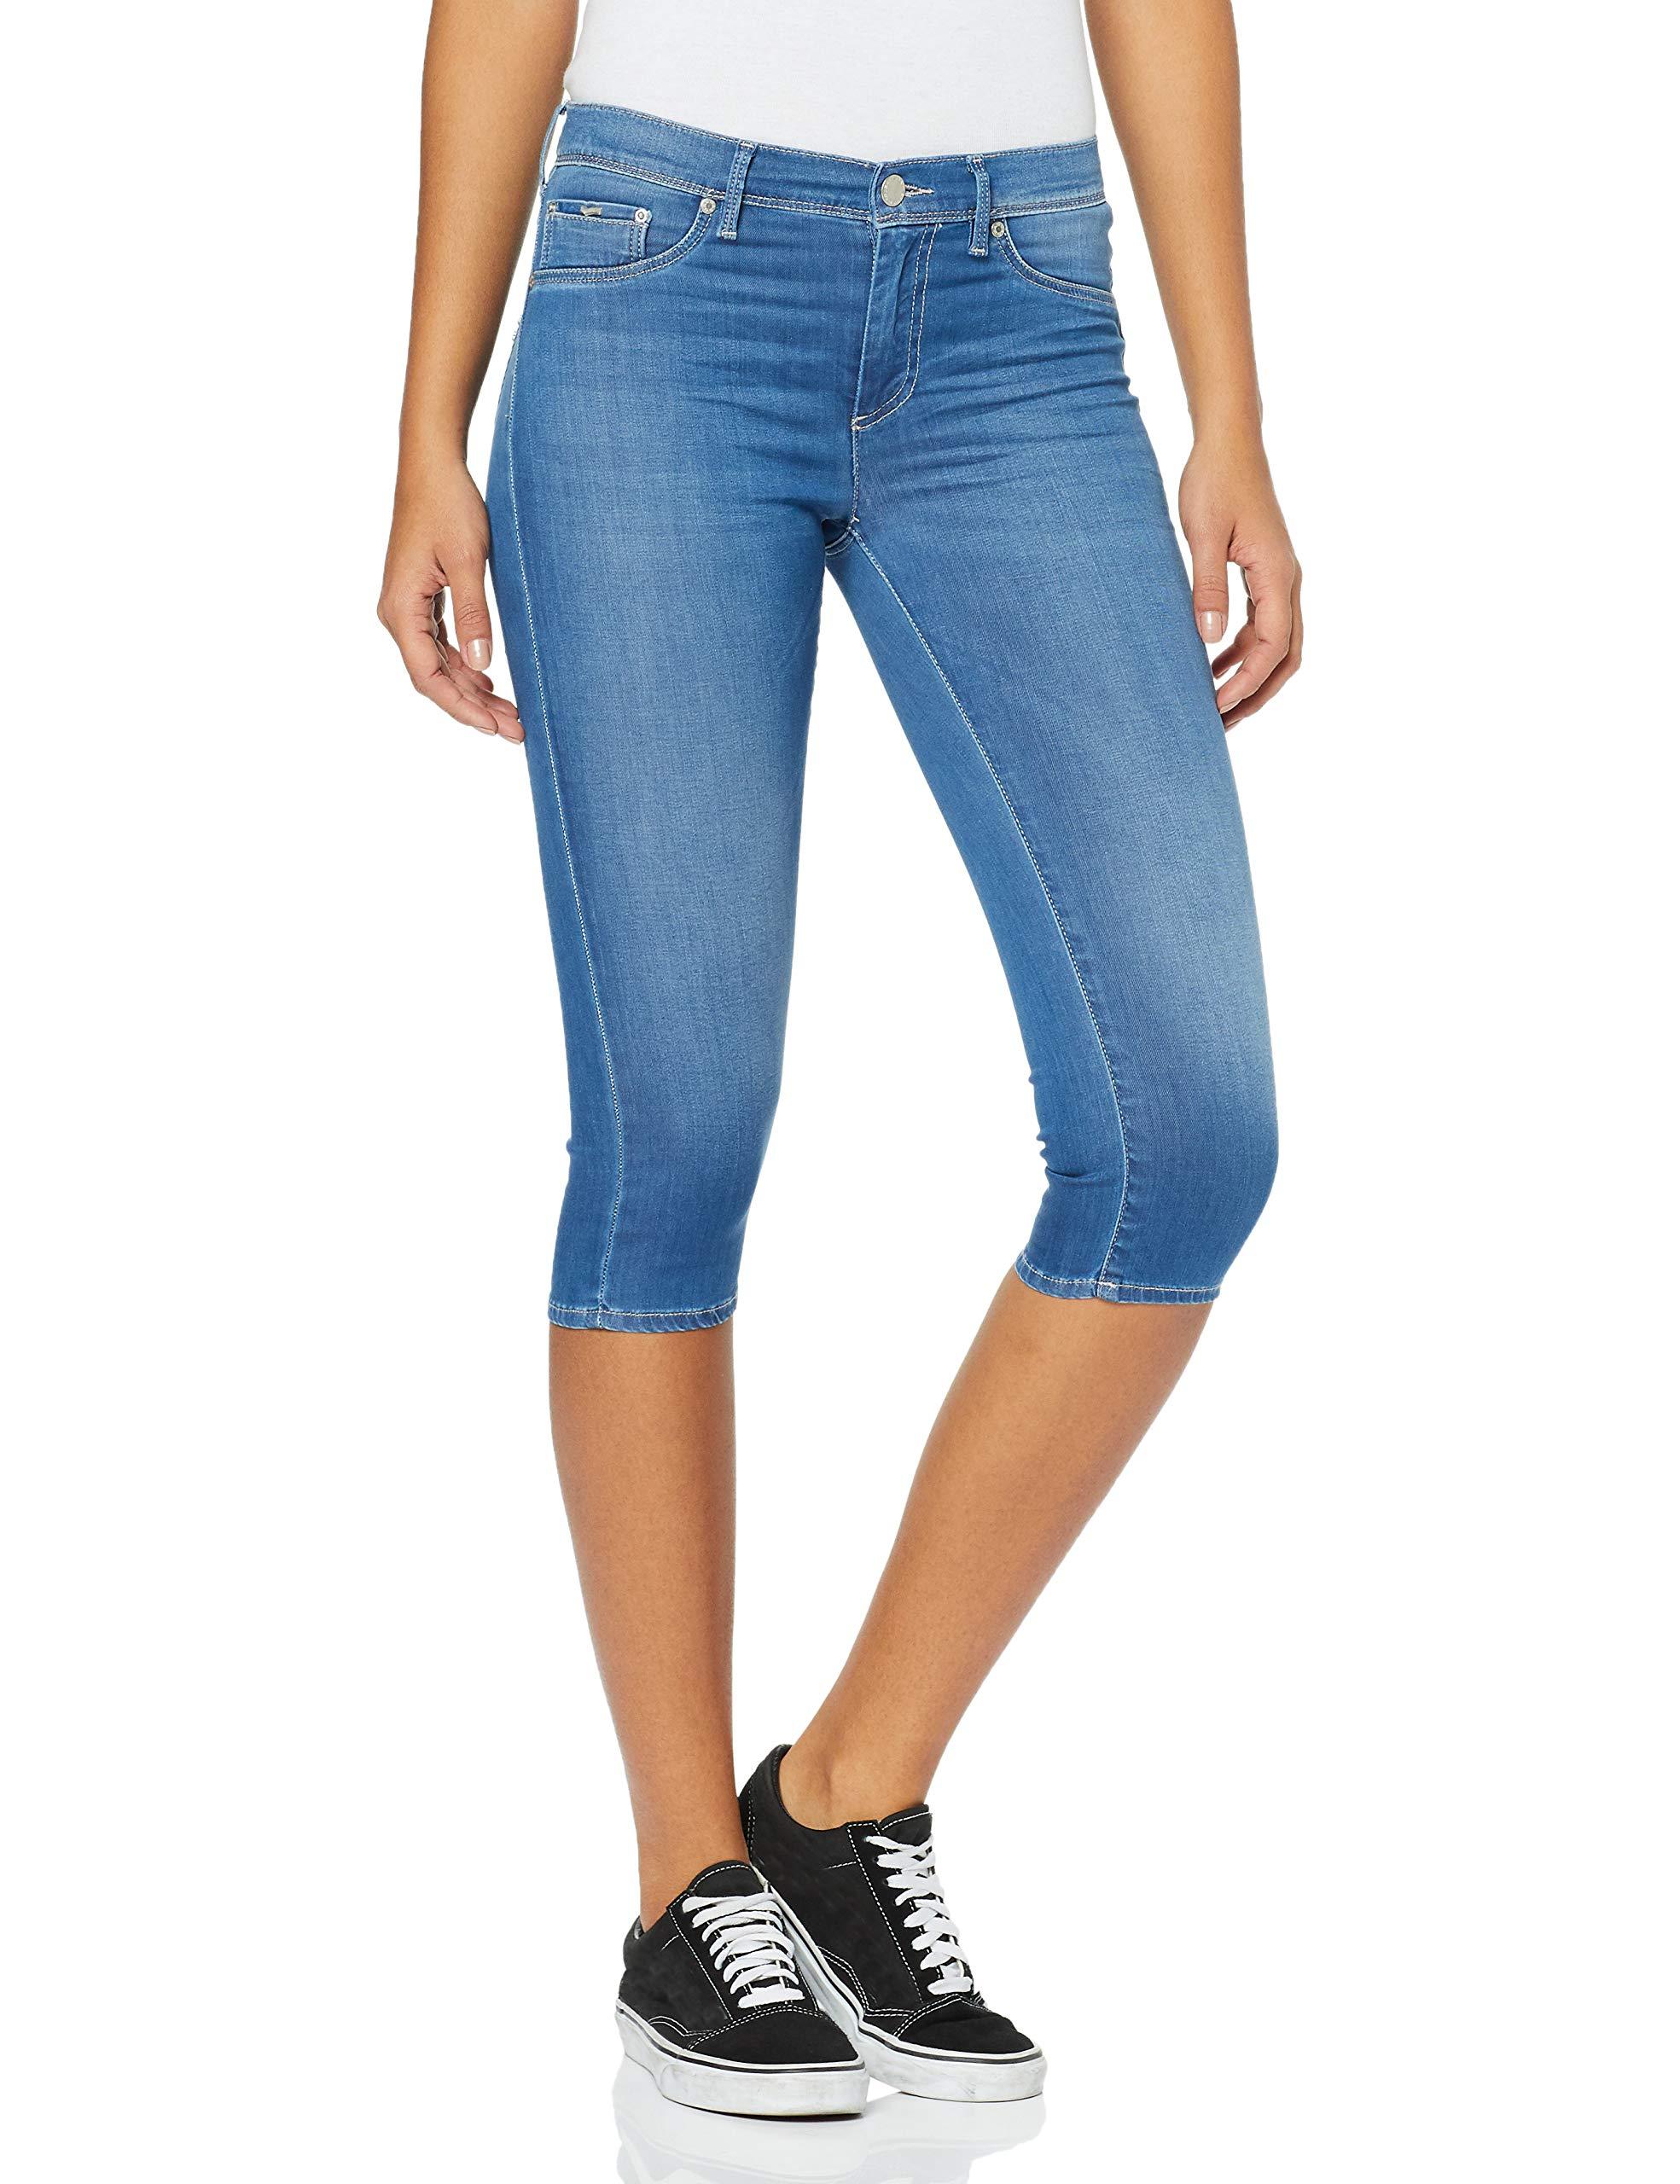 Jean SkinnyBleu Sumatra Wd2438taille Gas 3 Jeans Fabricant27Femme 4 mnwyN0P8vO